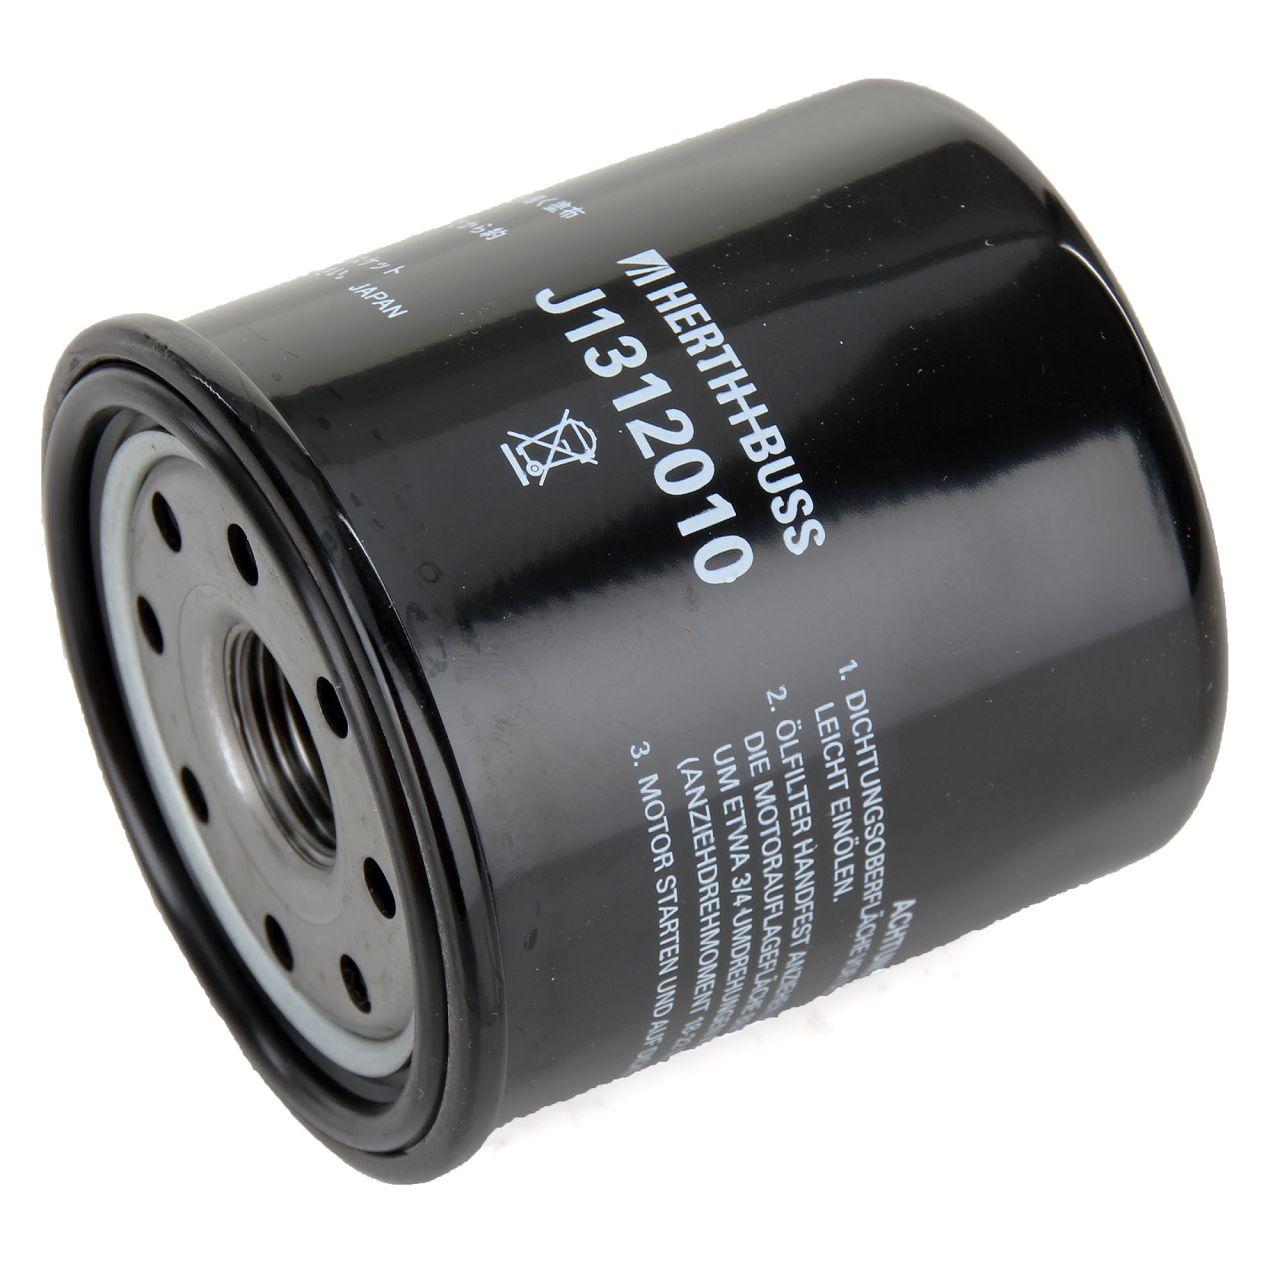 HERTH+BUSS JAKOPARTS Filterset für TOYOTA YARIS 1.0/1.3 VVT-i 69/87PS